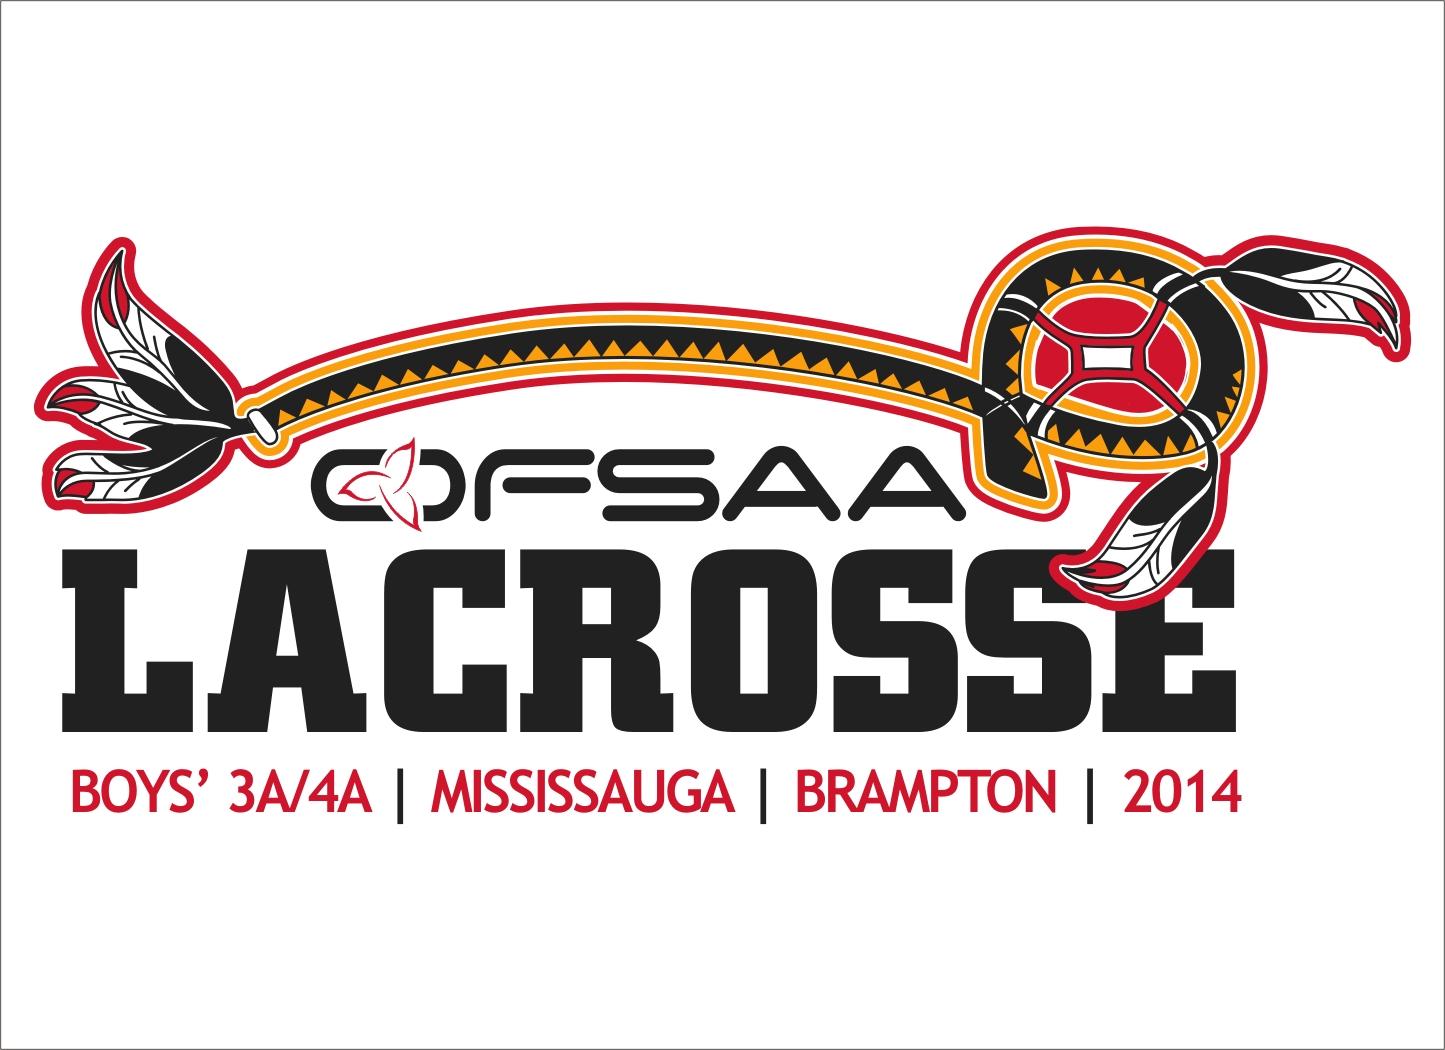 3A 4A Lacrosse logo.jpg